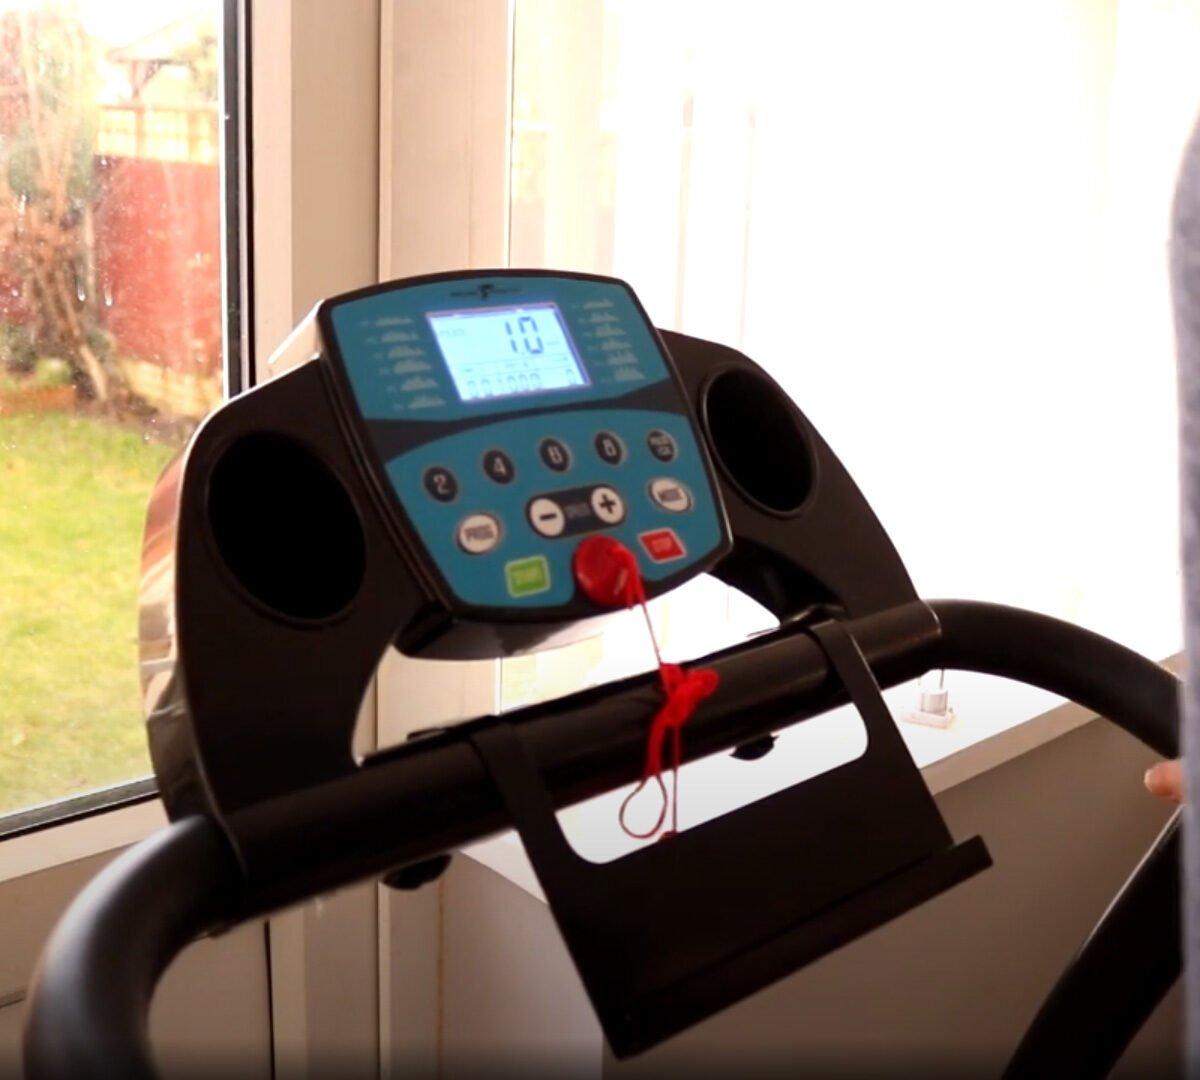 Nero Sports Treadmill with Bluetooth ready to run